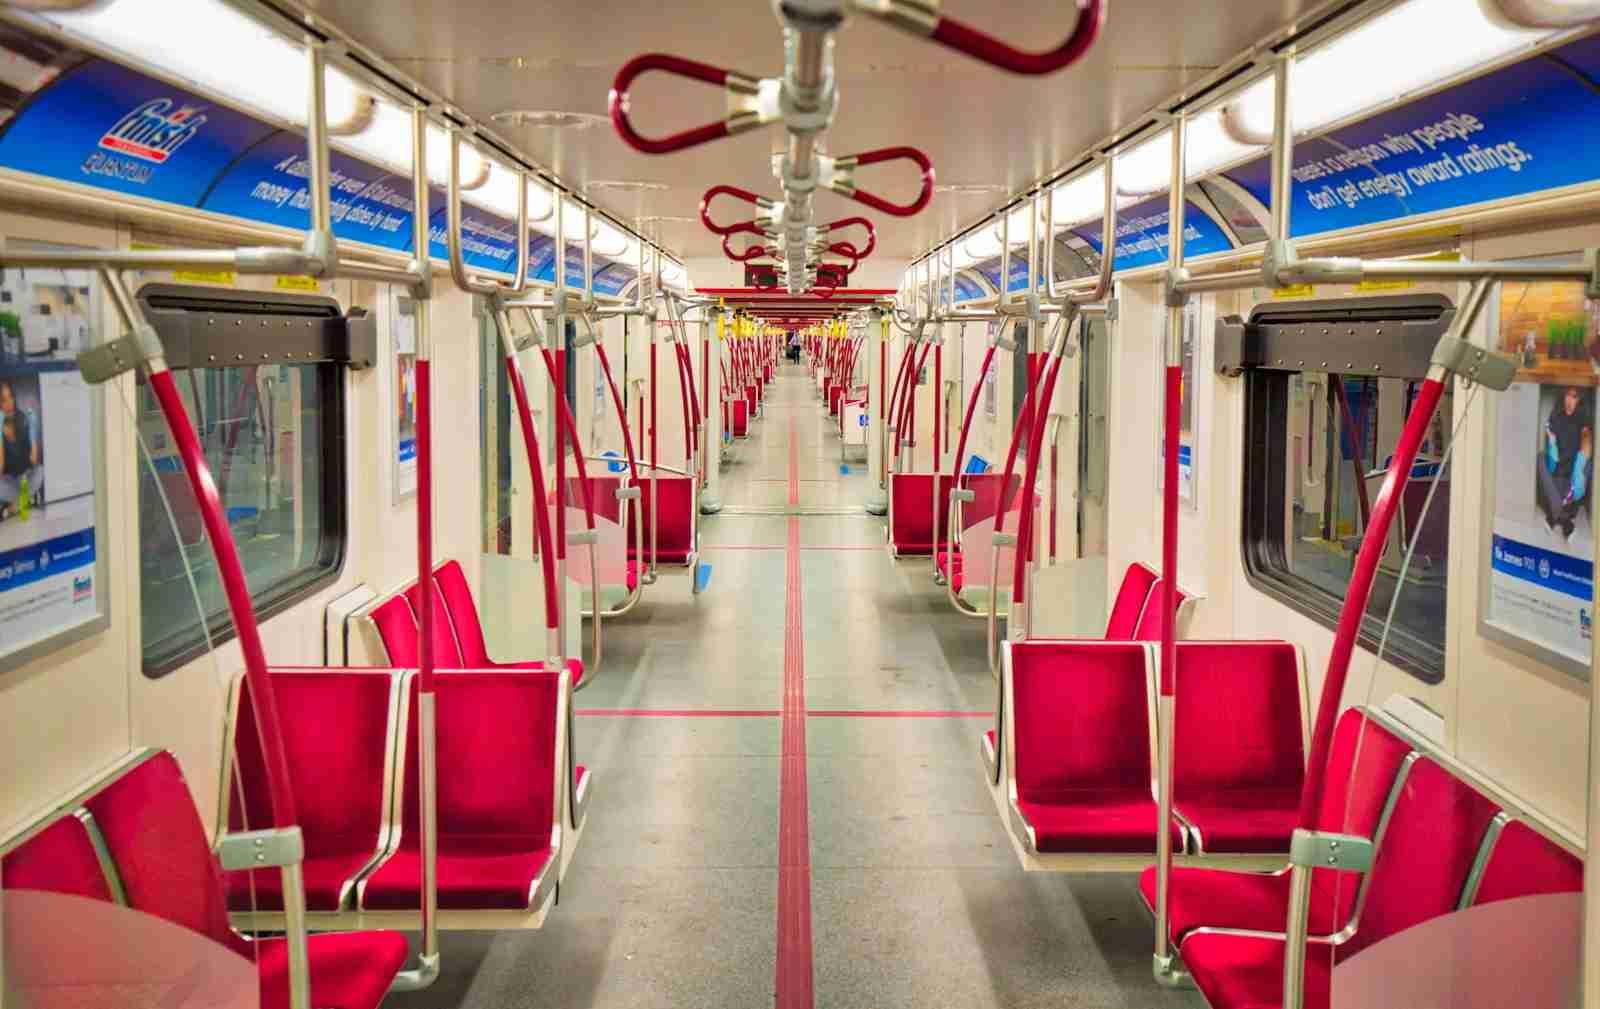 Renovated trains operating at Toronto Subway TTC lines. (Photo by Elijah Lovkoff / Getty Images)